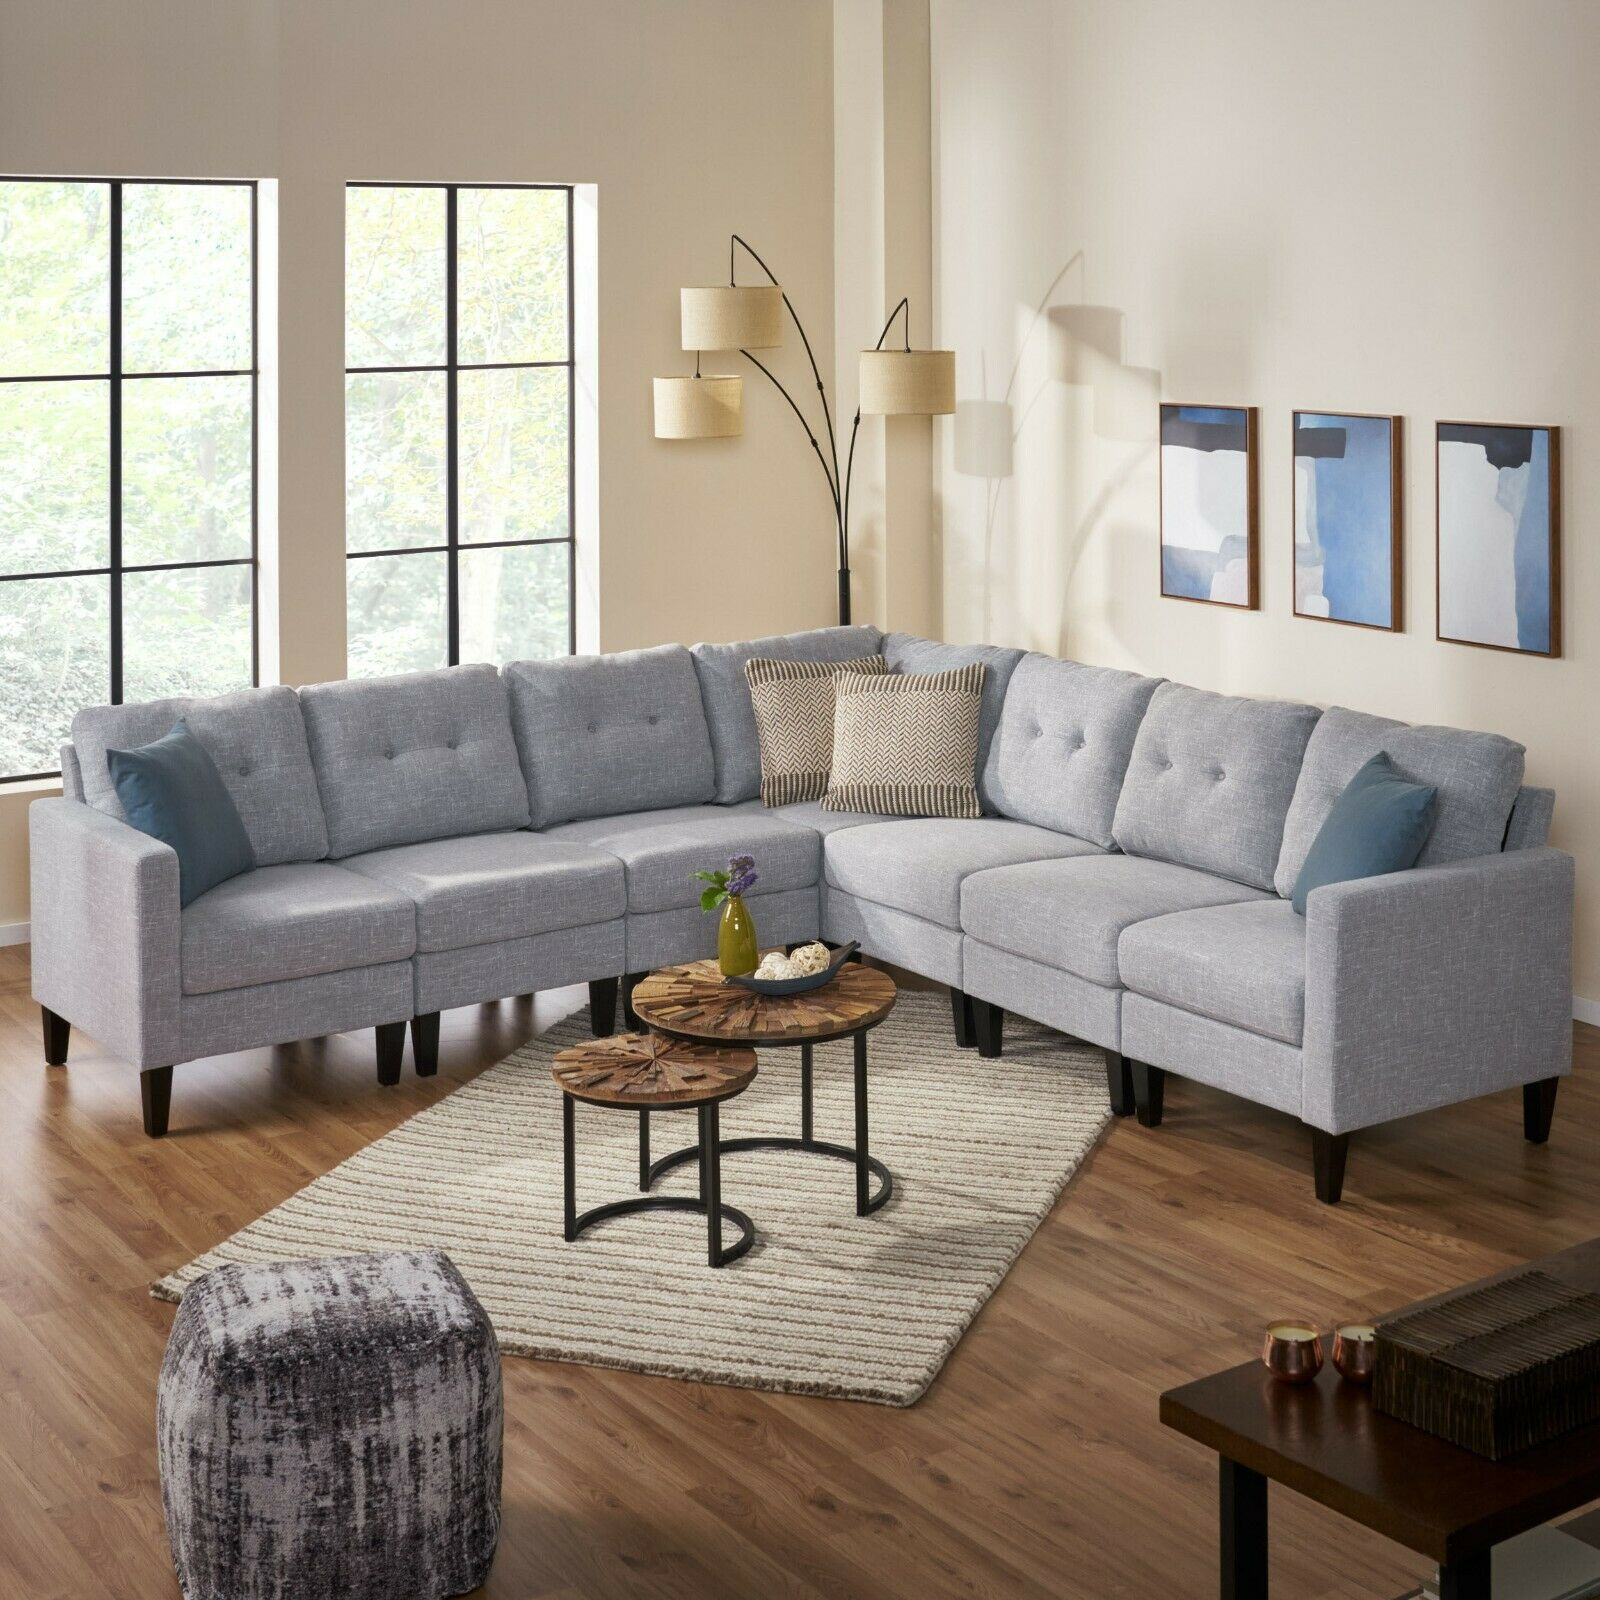 Marsh Mid Century Modern Extended Sectional Sofa Set Furniture